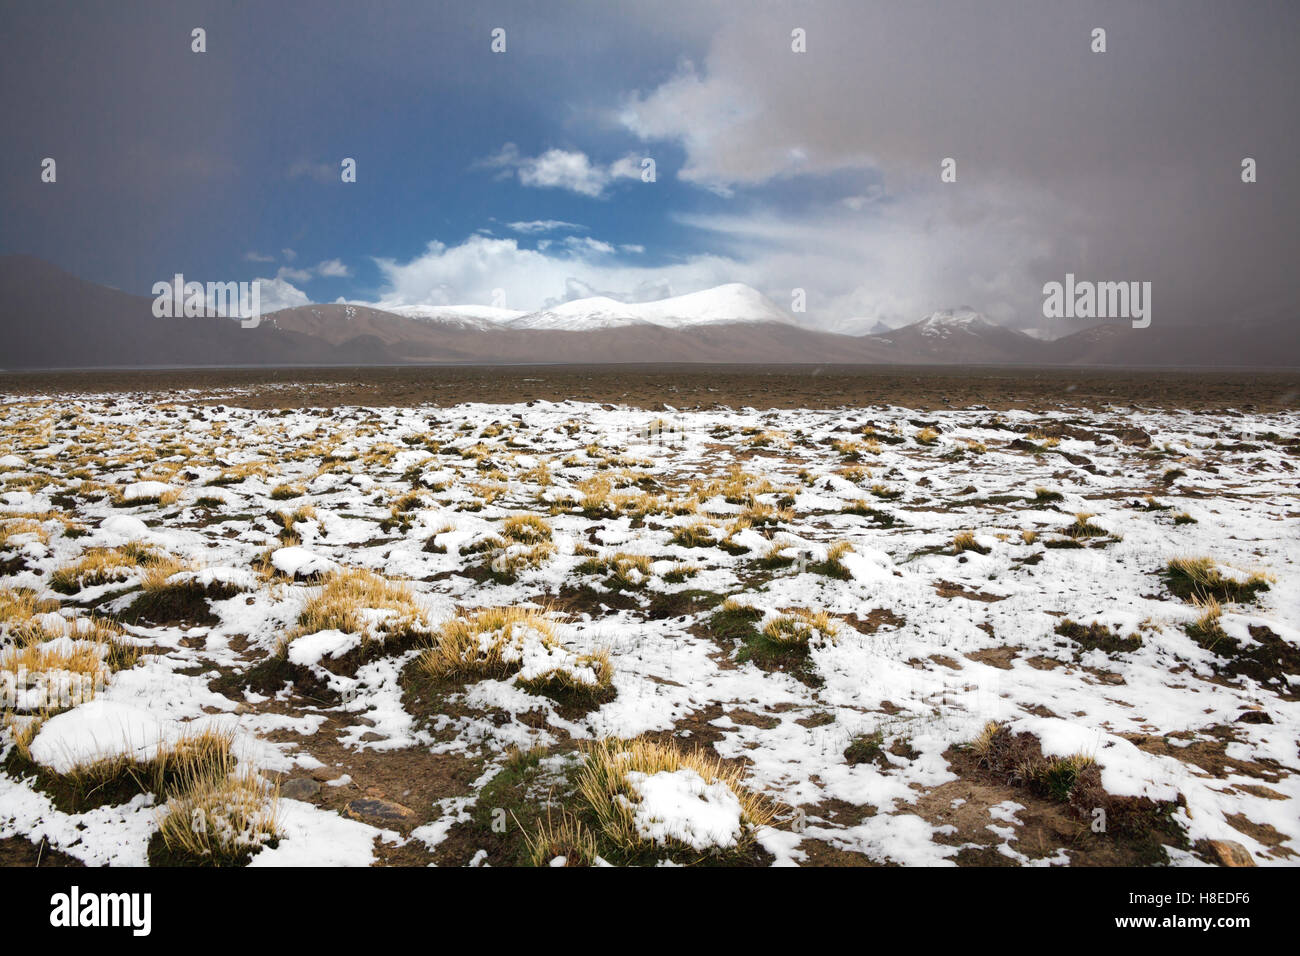 Paisaje cerca del lago Karakul - Pamir - T - ajikistan GBAO provincia - Techo del mundo Imagen De Stock